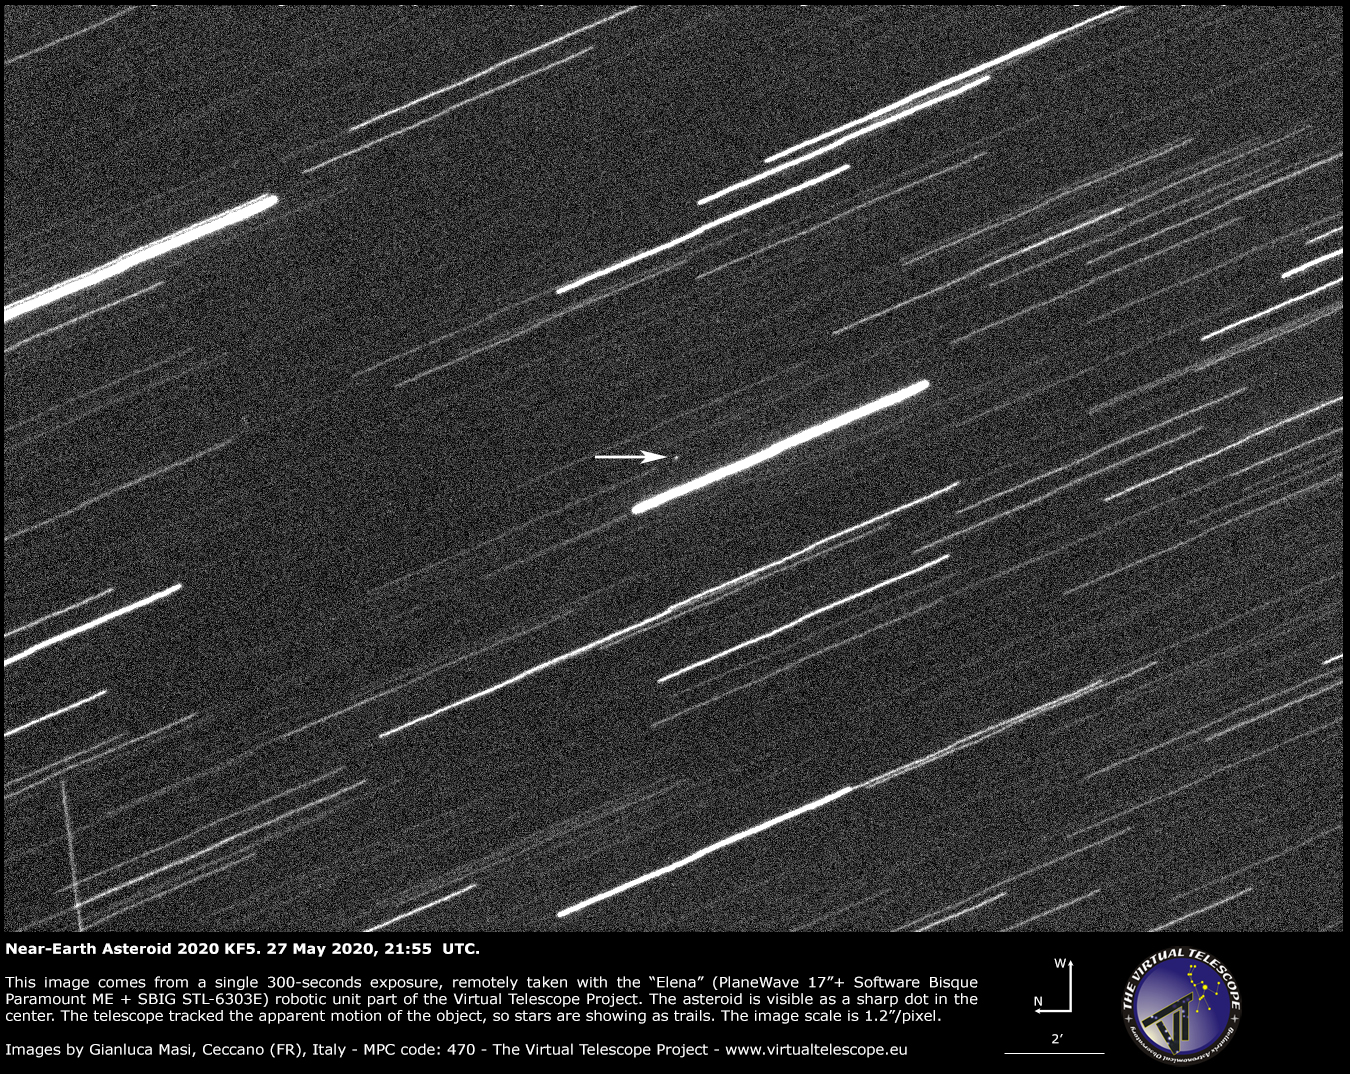 Near-Earth Asteroid 2020 KF5 - 27 May 2020.